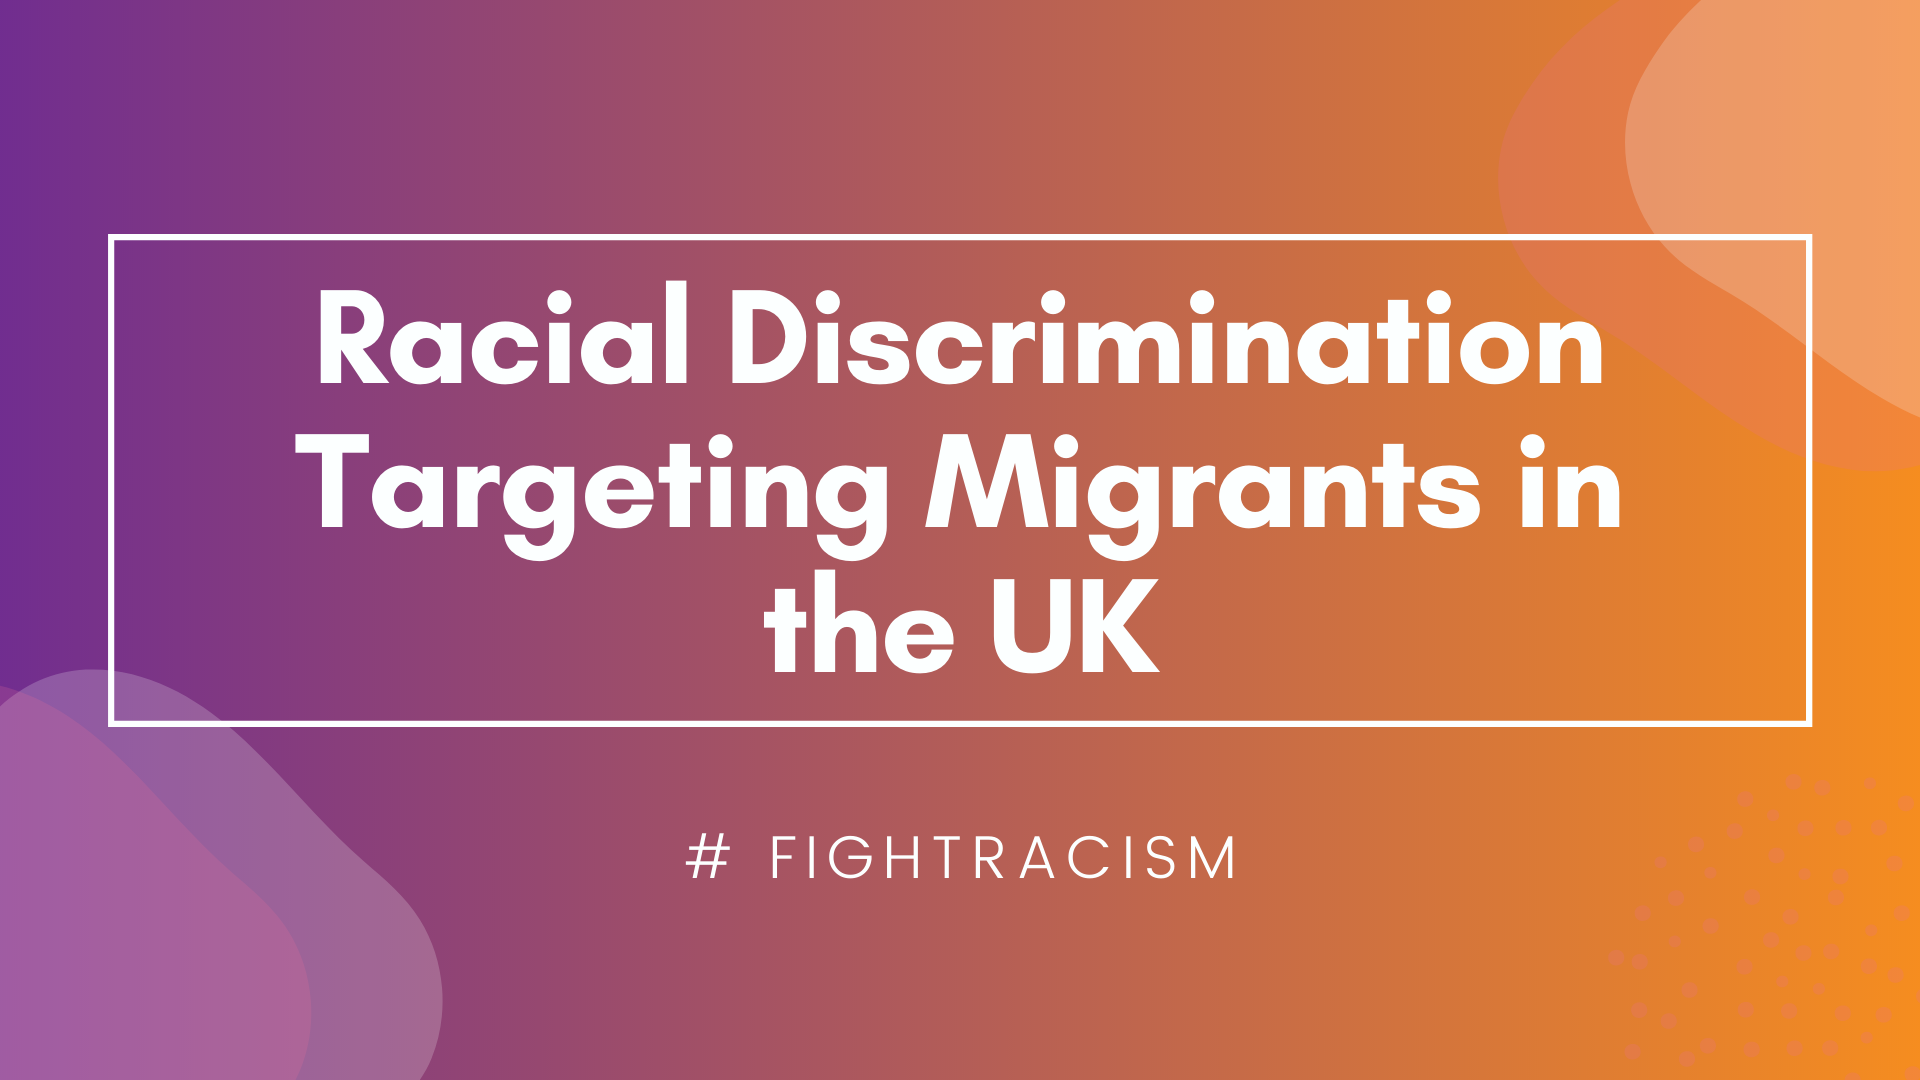 Racial Discrimination Targeting Migrants in the UK